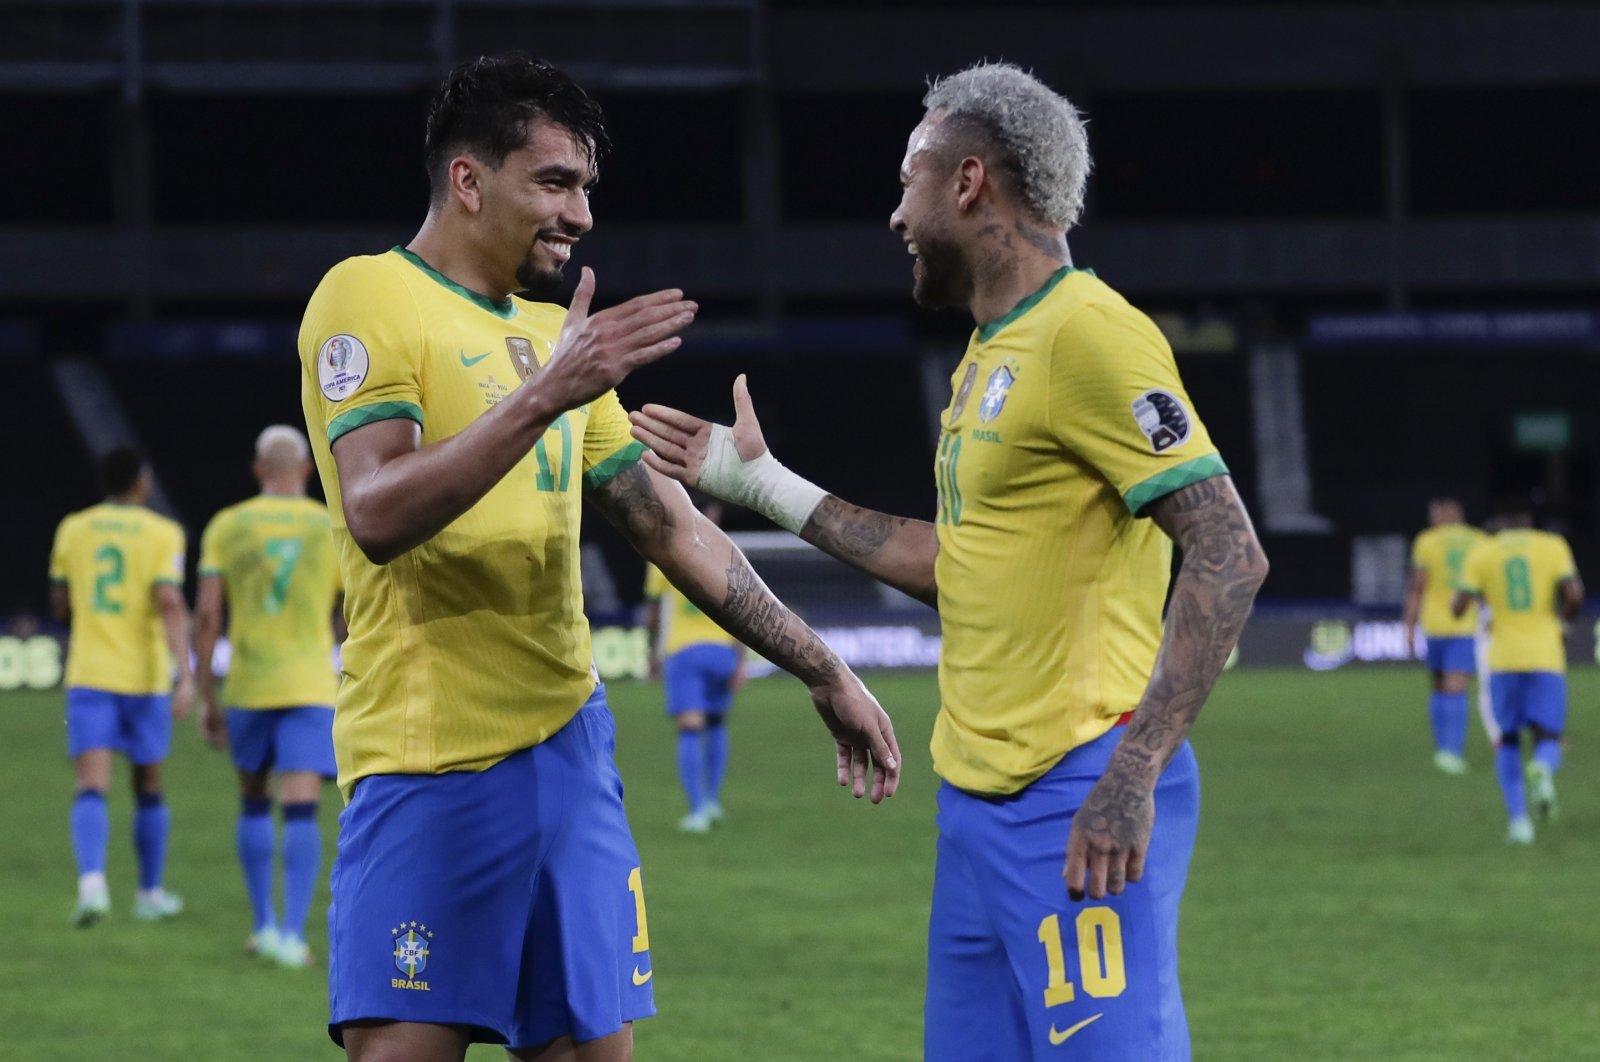 Brazil's Lucas Paqueta (L) celebrates with teammate Neymar after scoring his side's opening goal in the Copa America semifinal against Peru at Nilton Santos stadium in Rio de Janeiro, Brazil, July 5, 2021. (AP Photo)